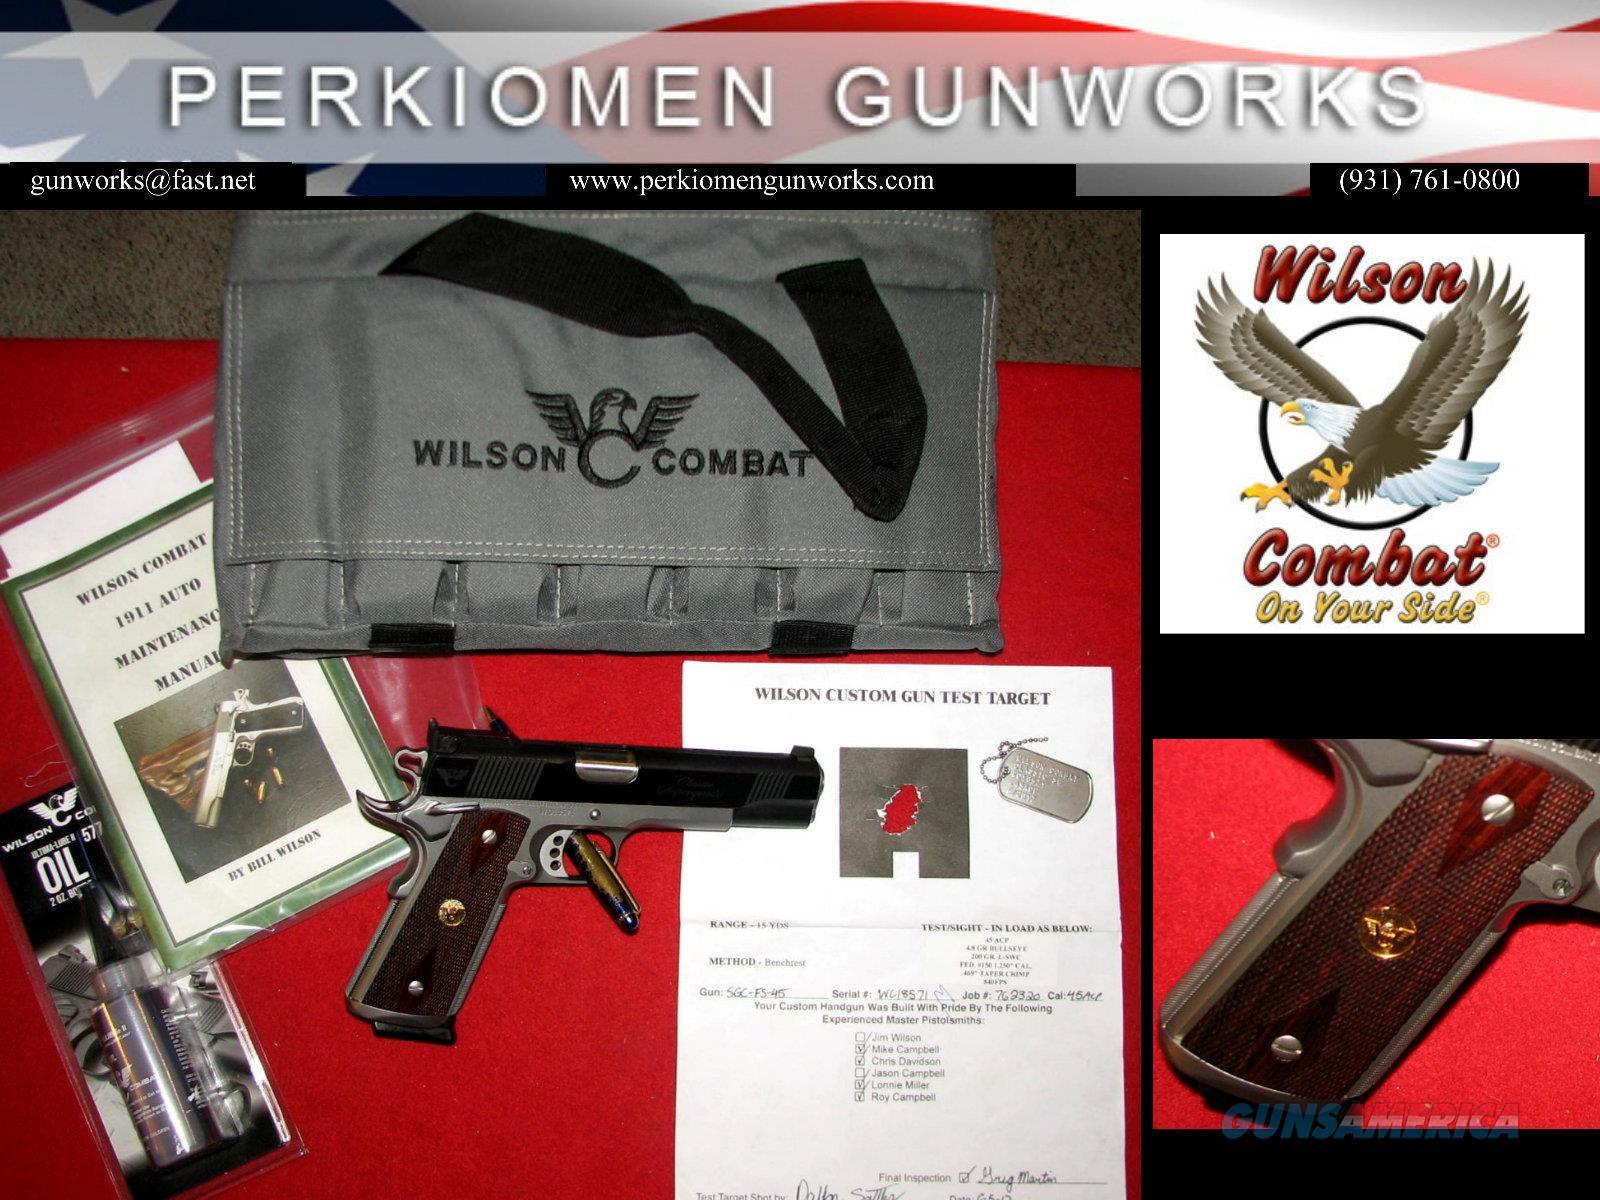 Classic SuperGrade, Two-Tone w/options - New in Box  Guns > Pistols > Wilson Combat Pistols